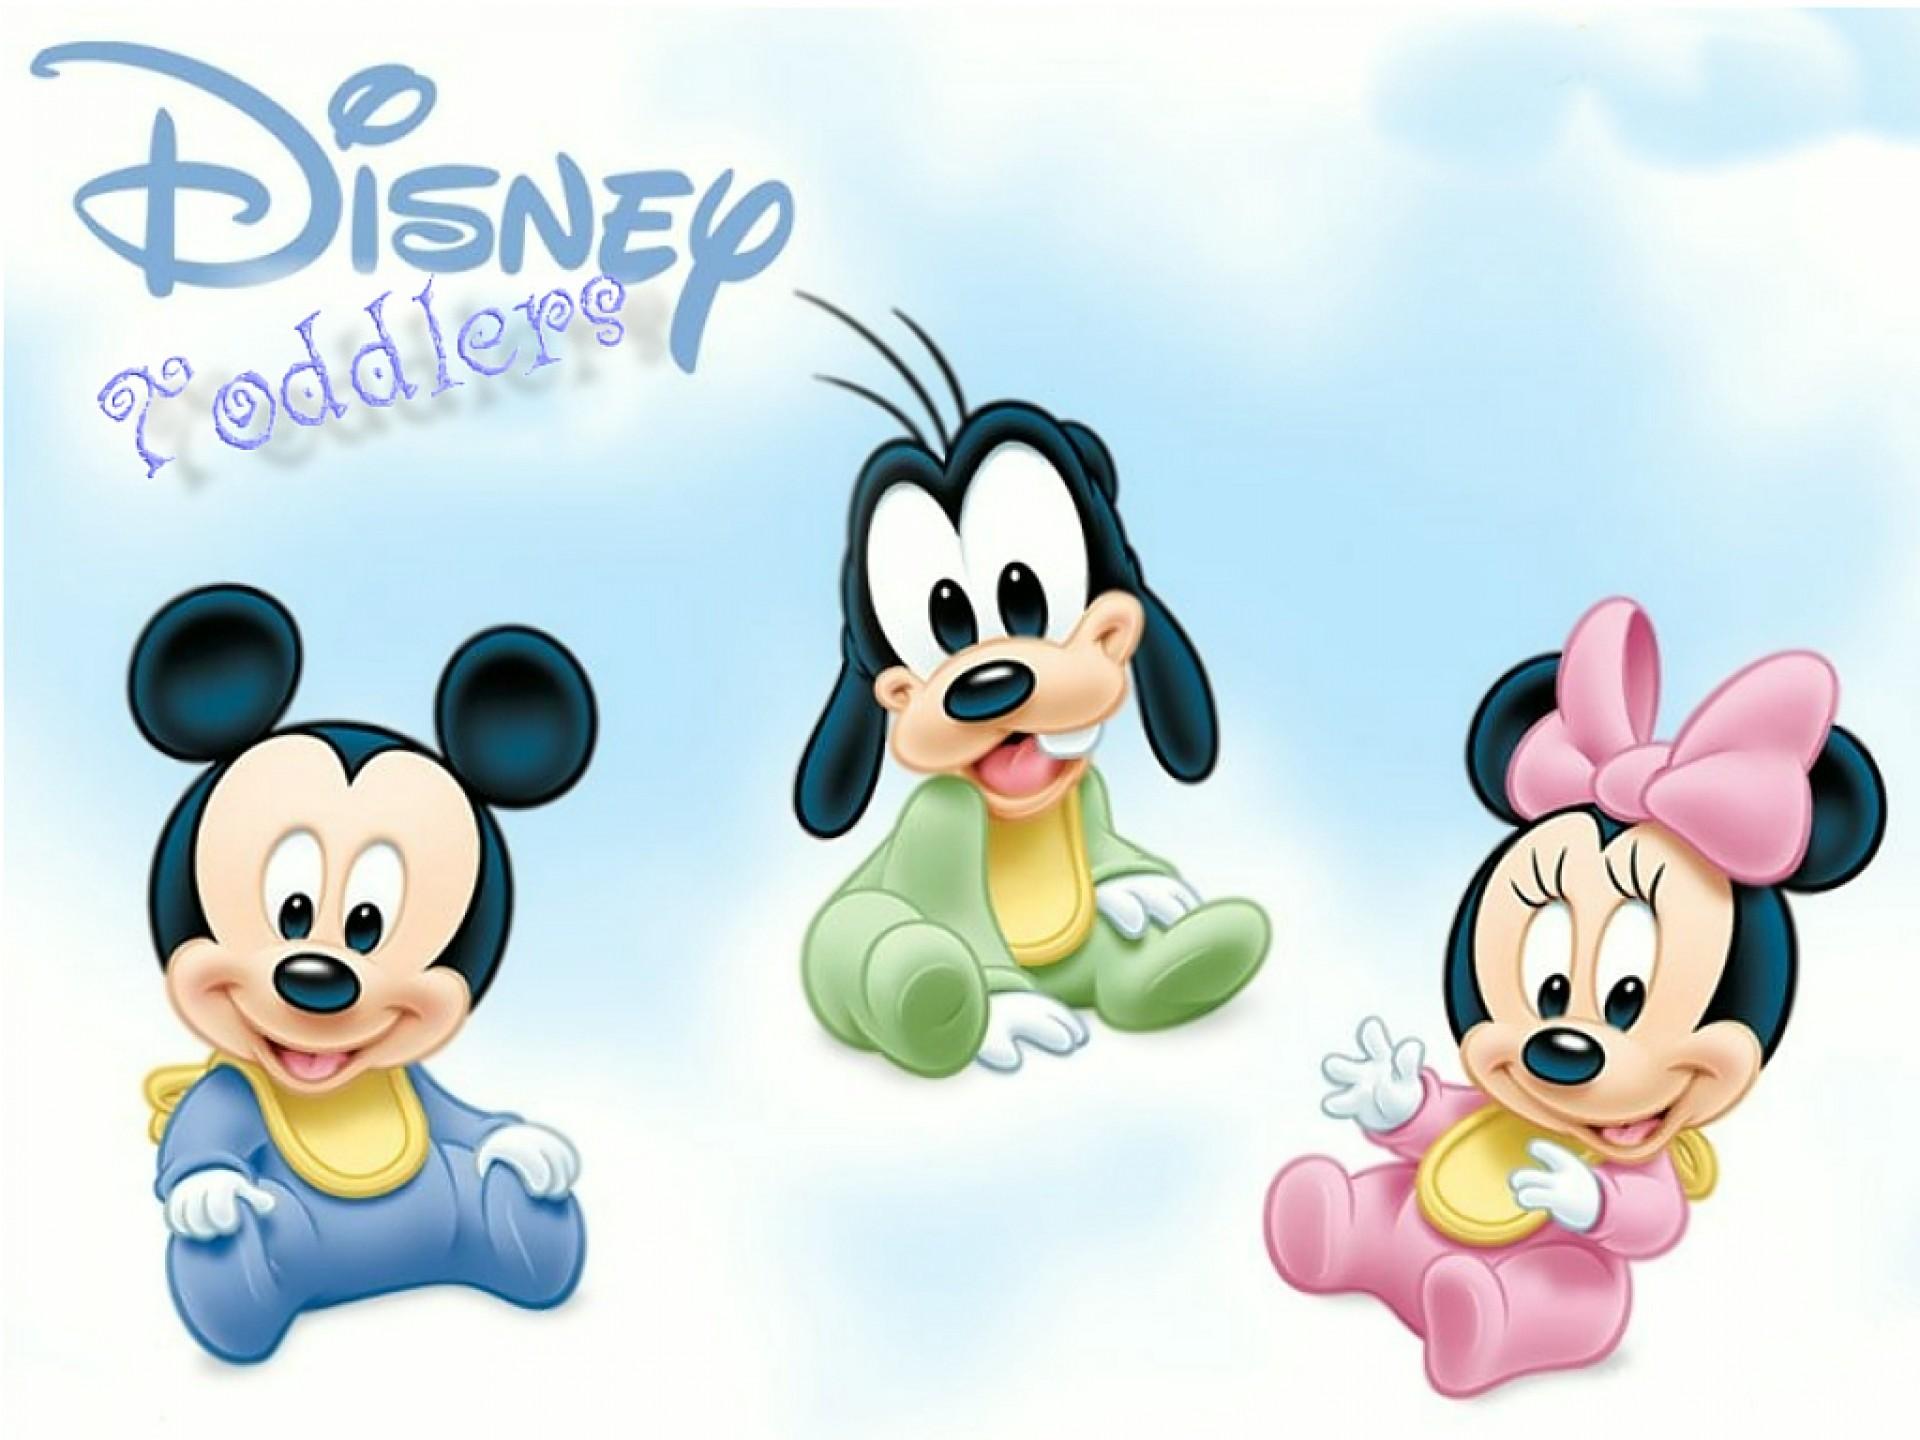 Cartoon Characters Walt Disney Wallpaper Deskt #10716 Wallpaper .